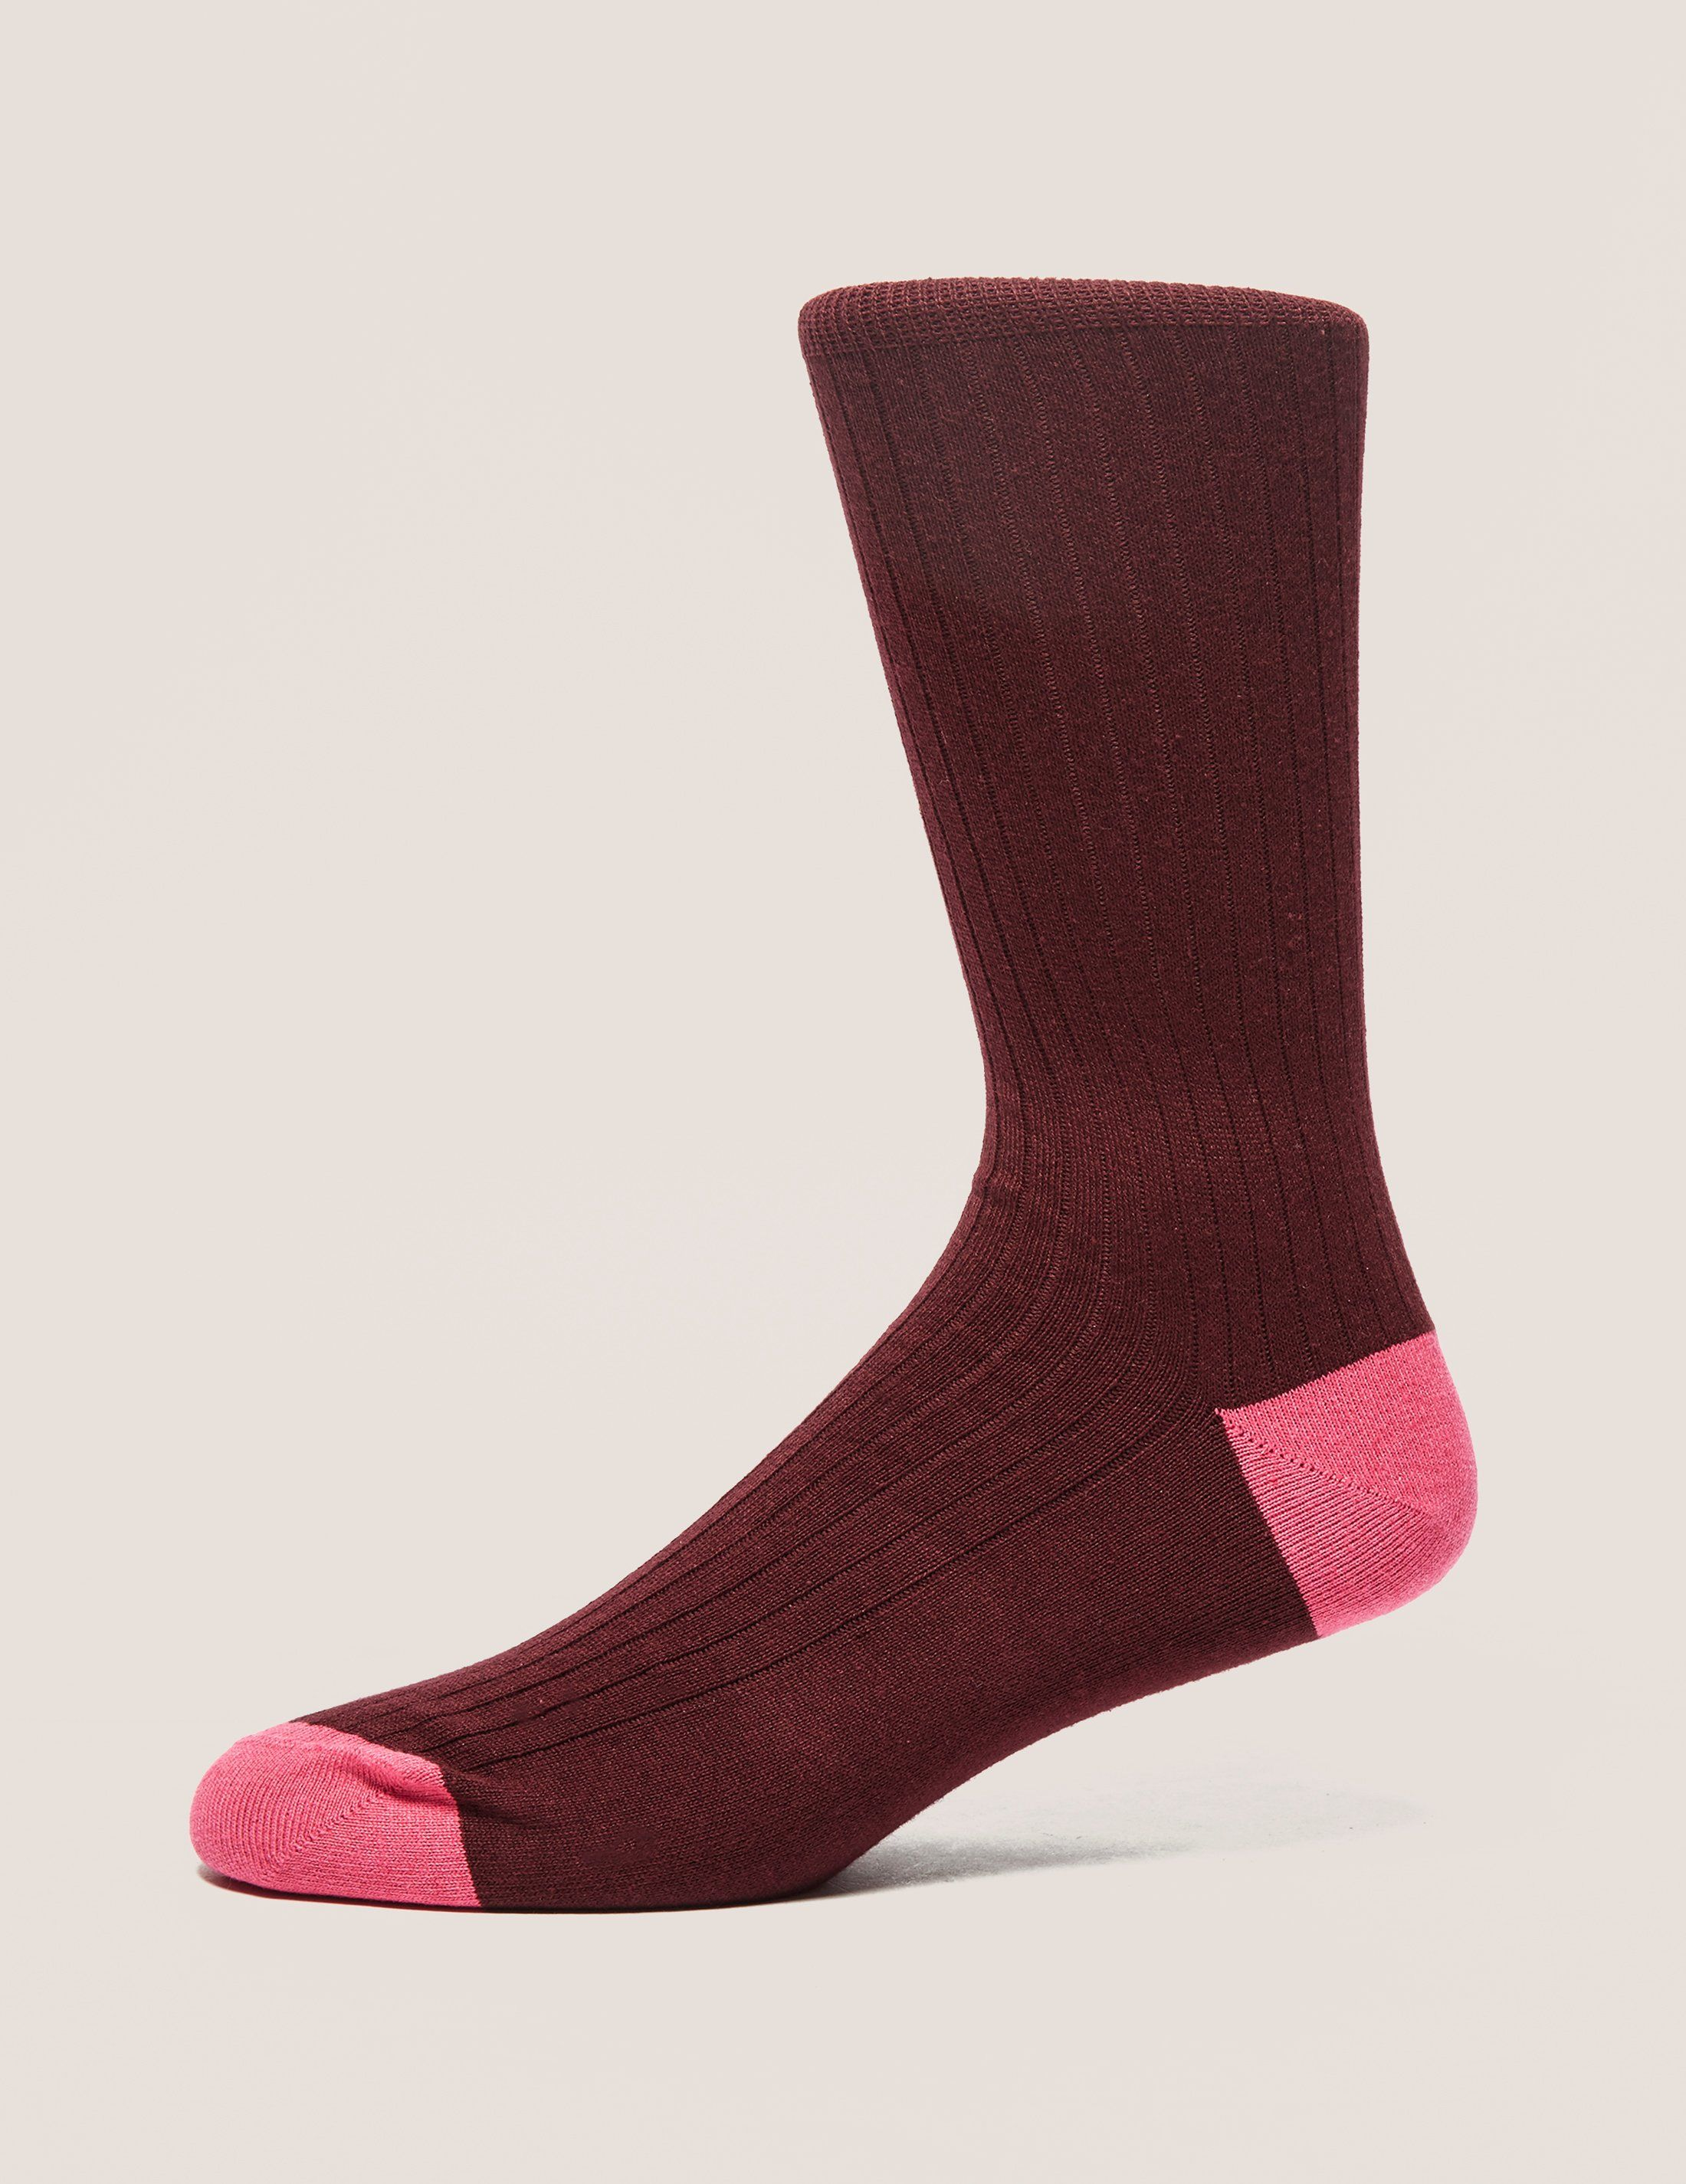 Paul Smith Two-Tone Ribbed Socks